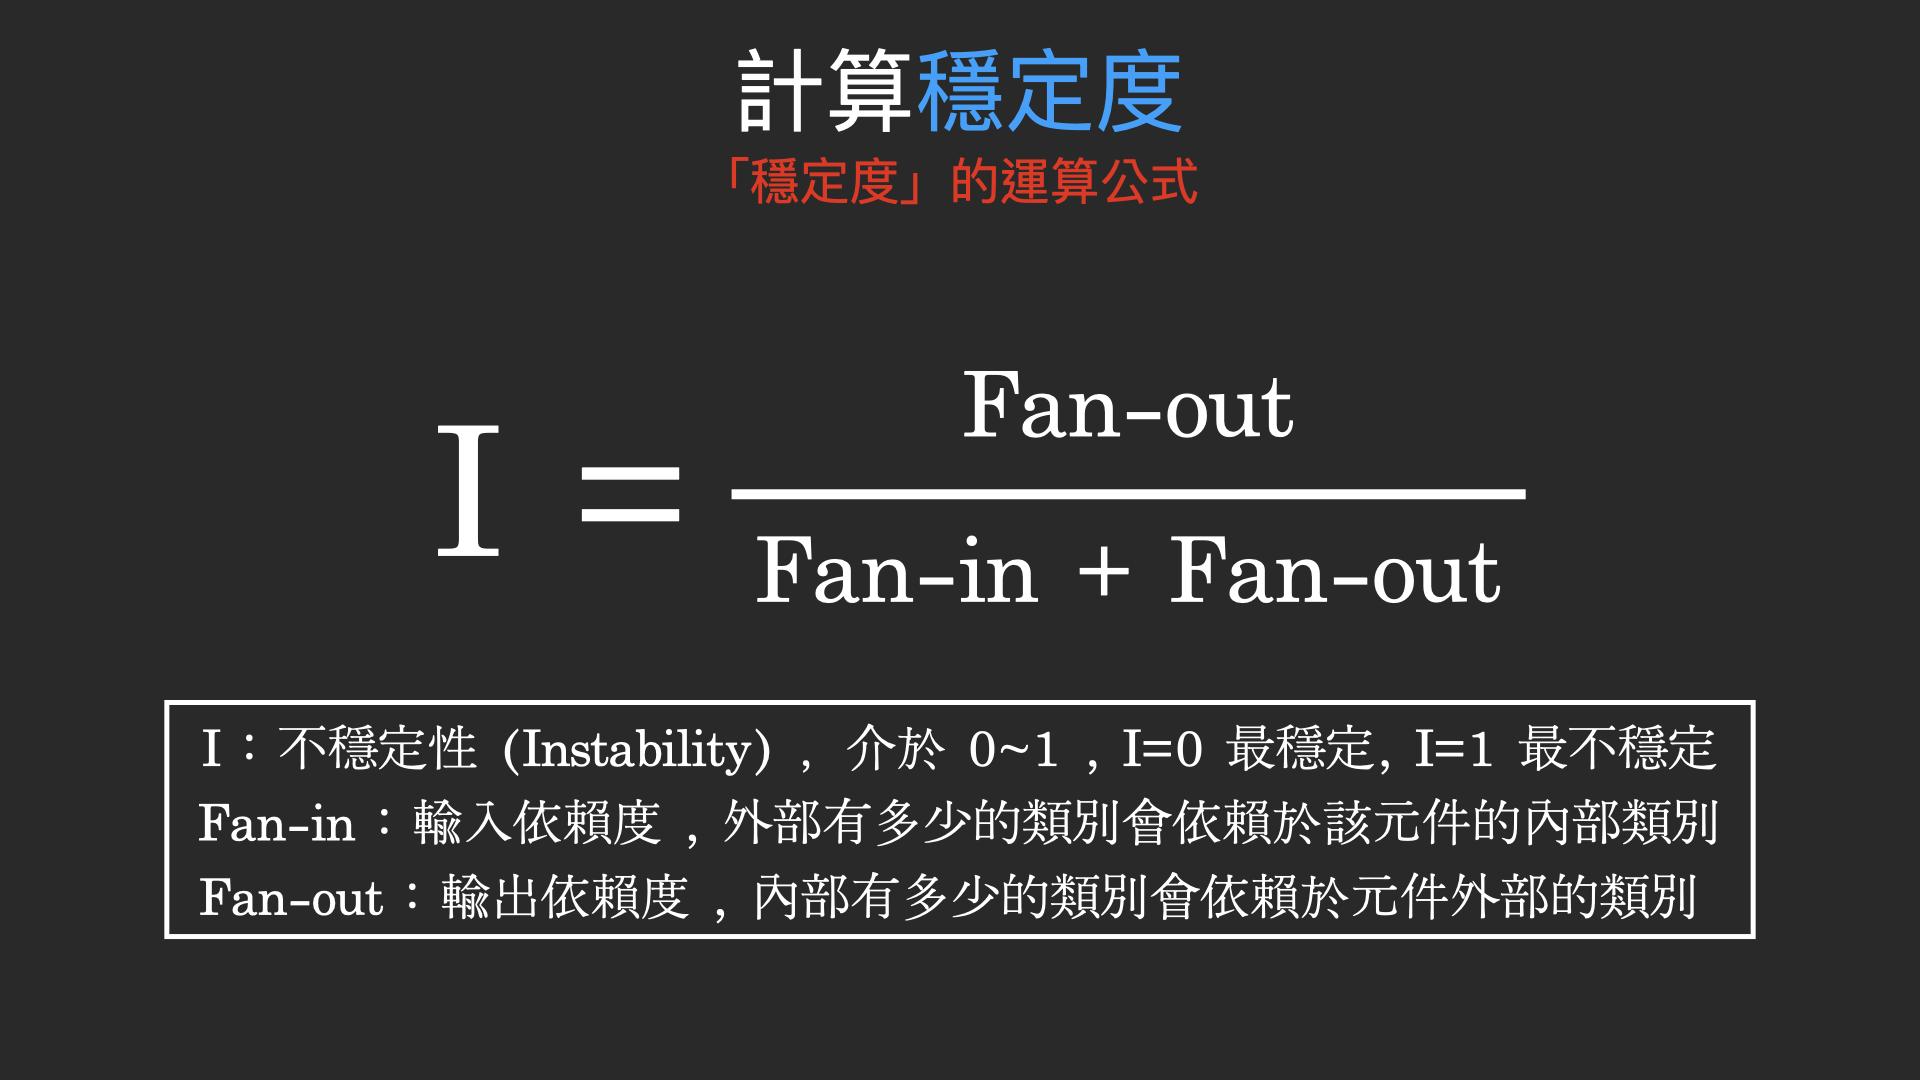 004-4.formula